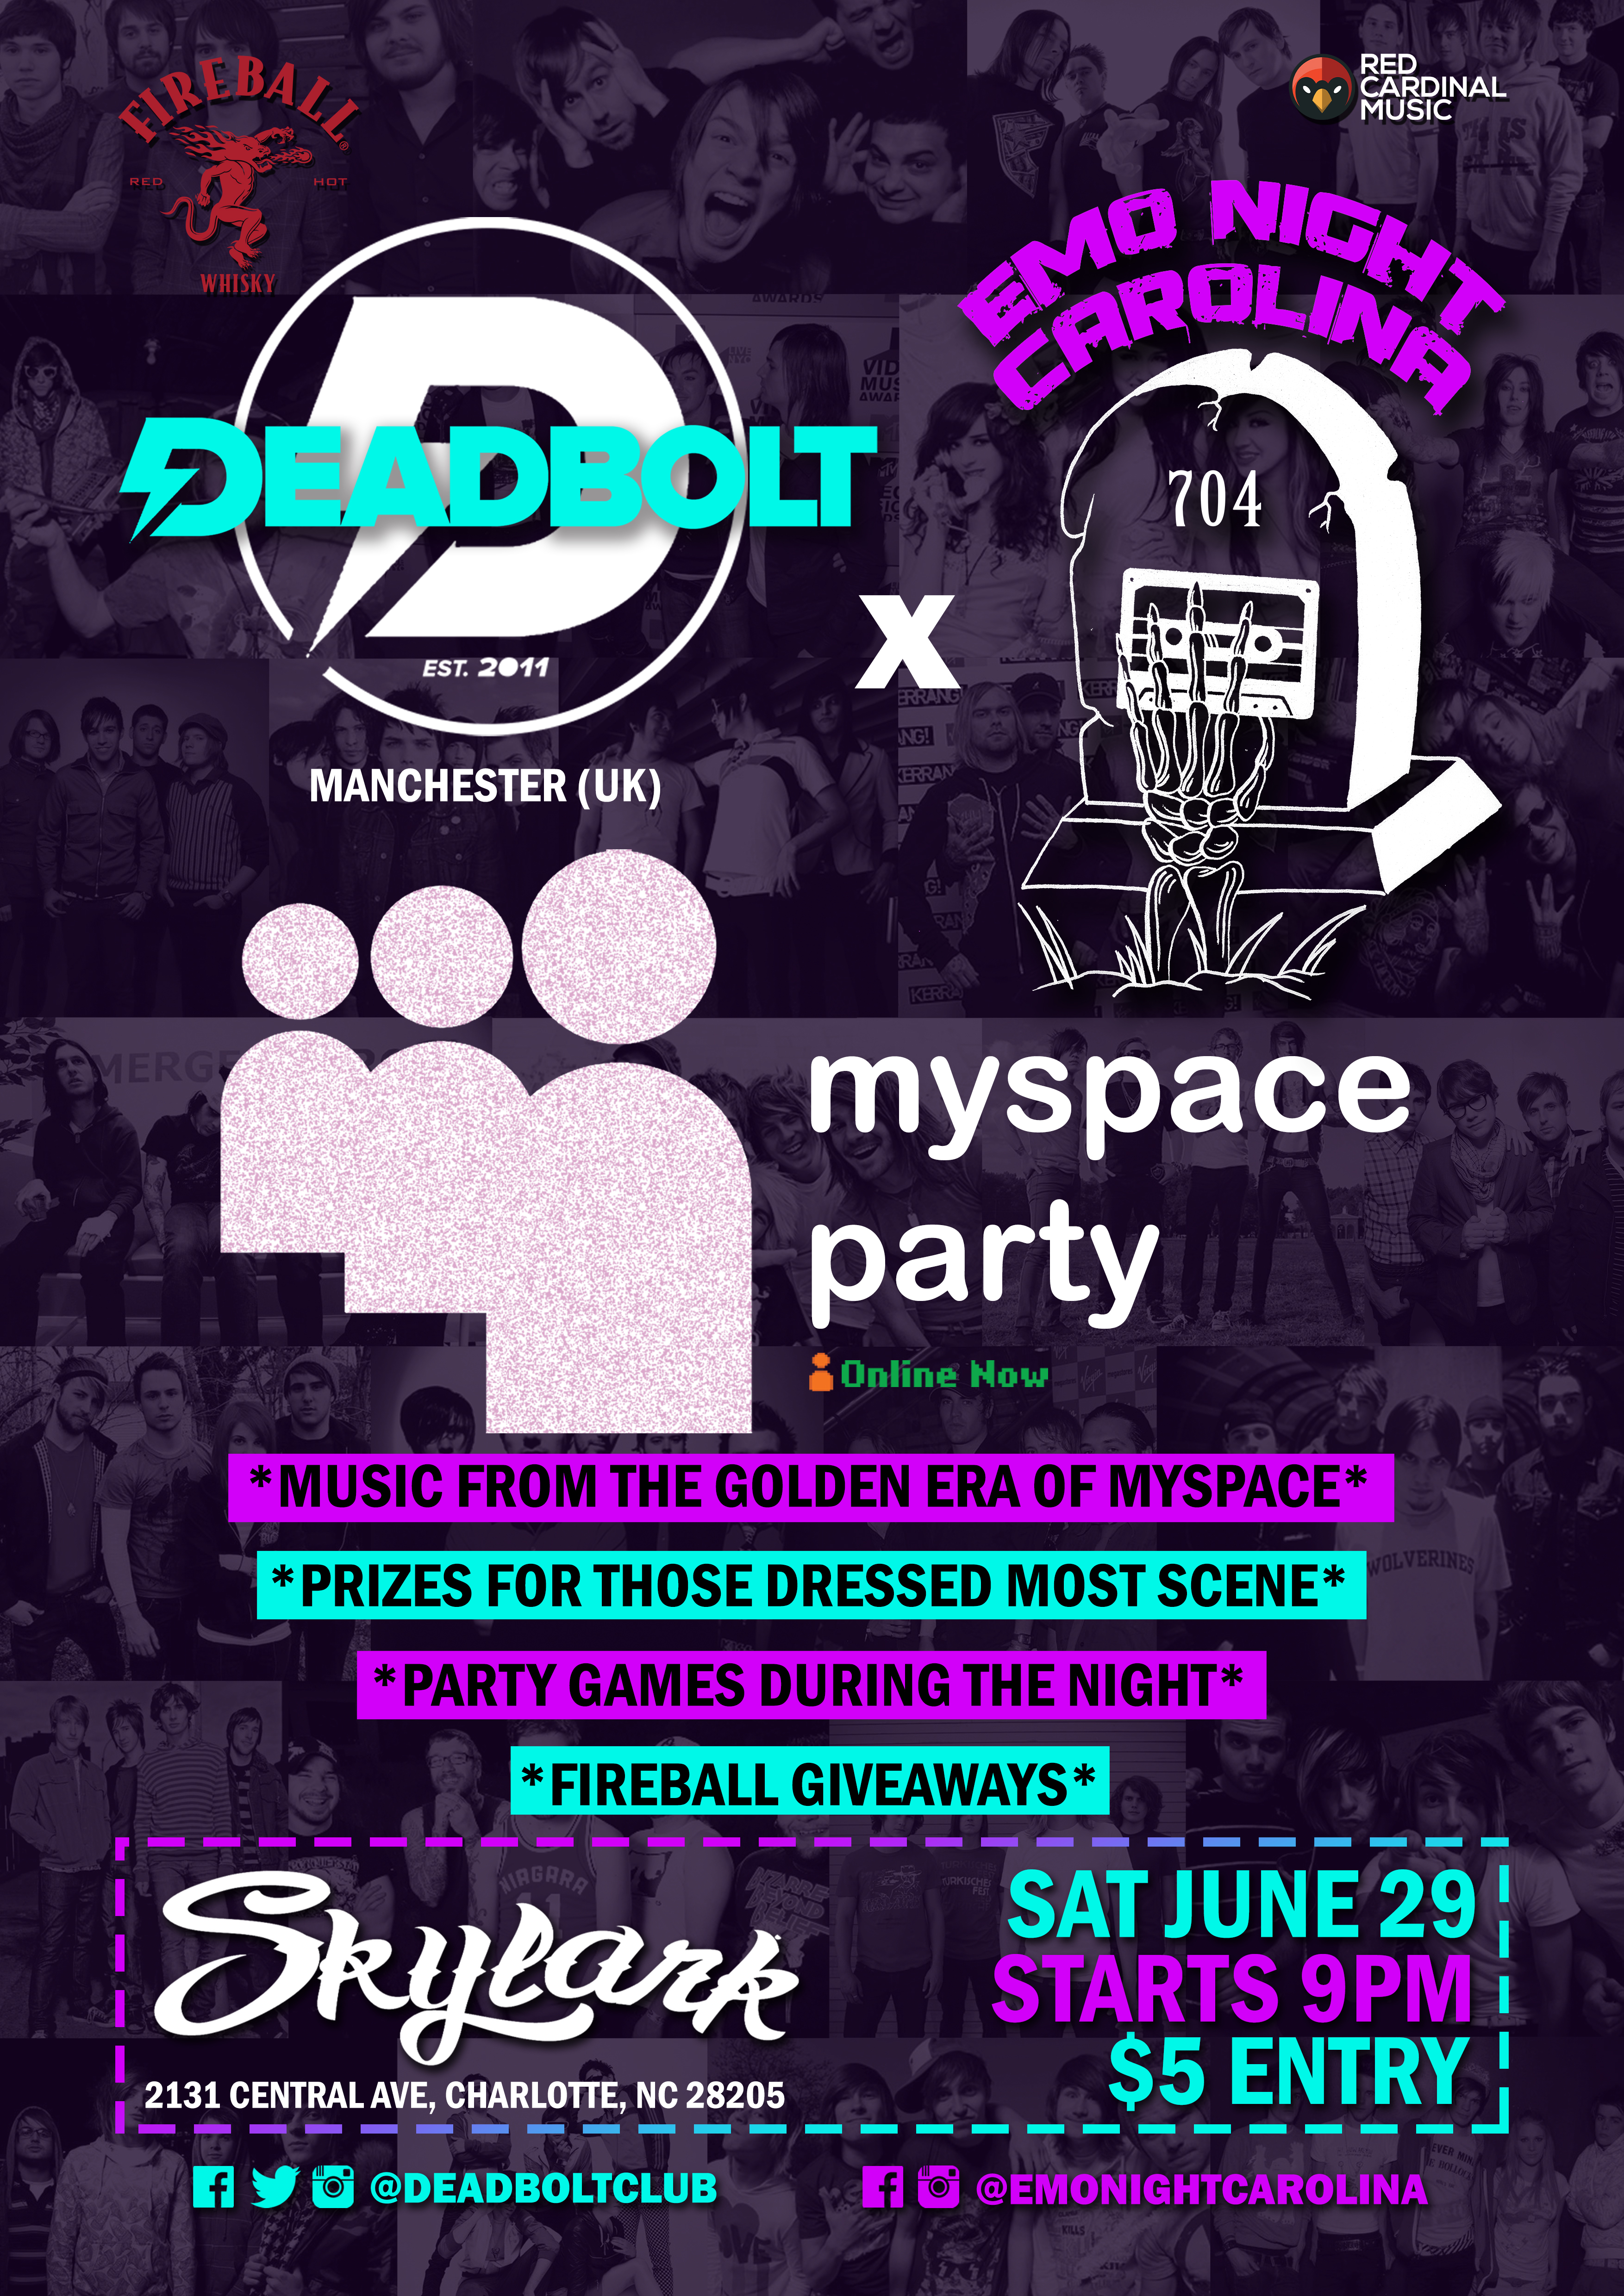 Deadbolt x Emo Night Carolina - Myspace Party 2019 - Charlotte North Carolina - Red Cardinal Music